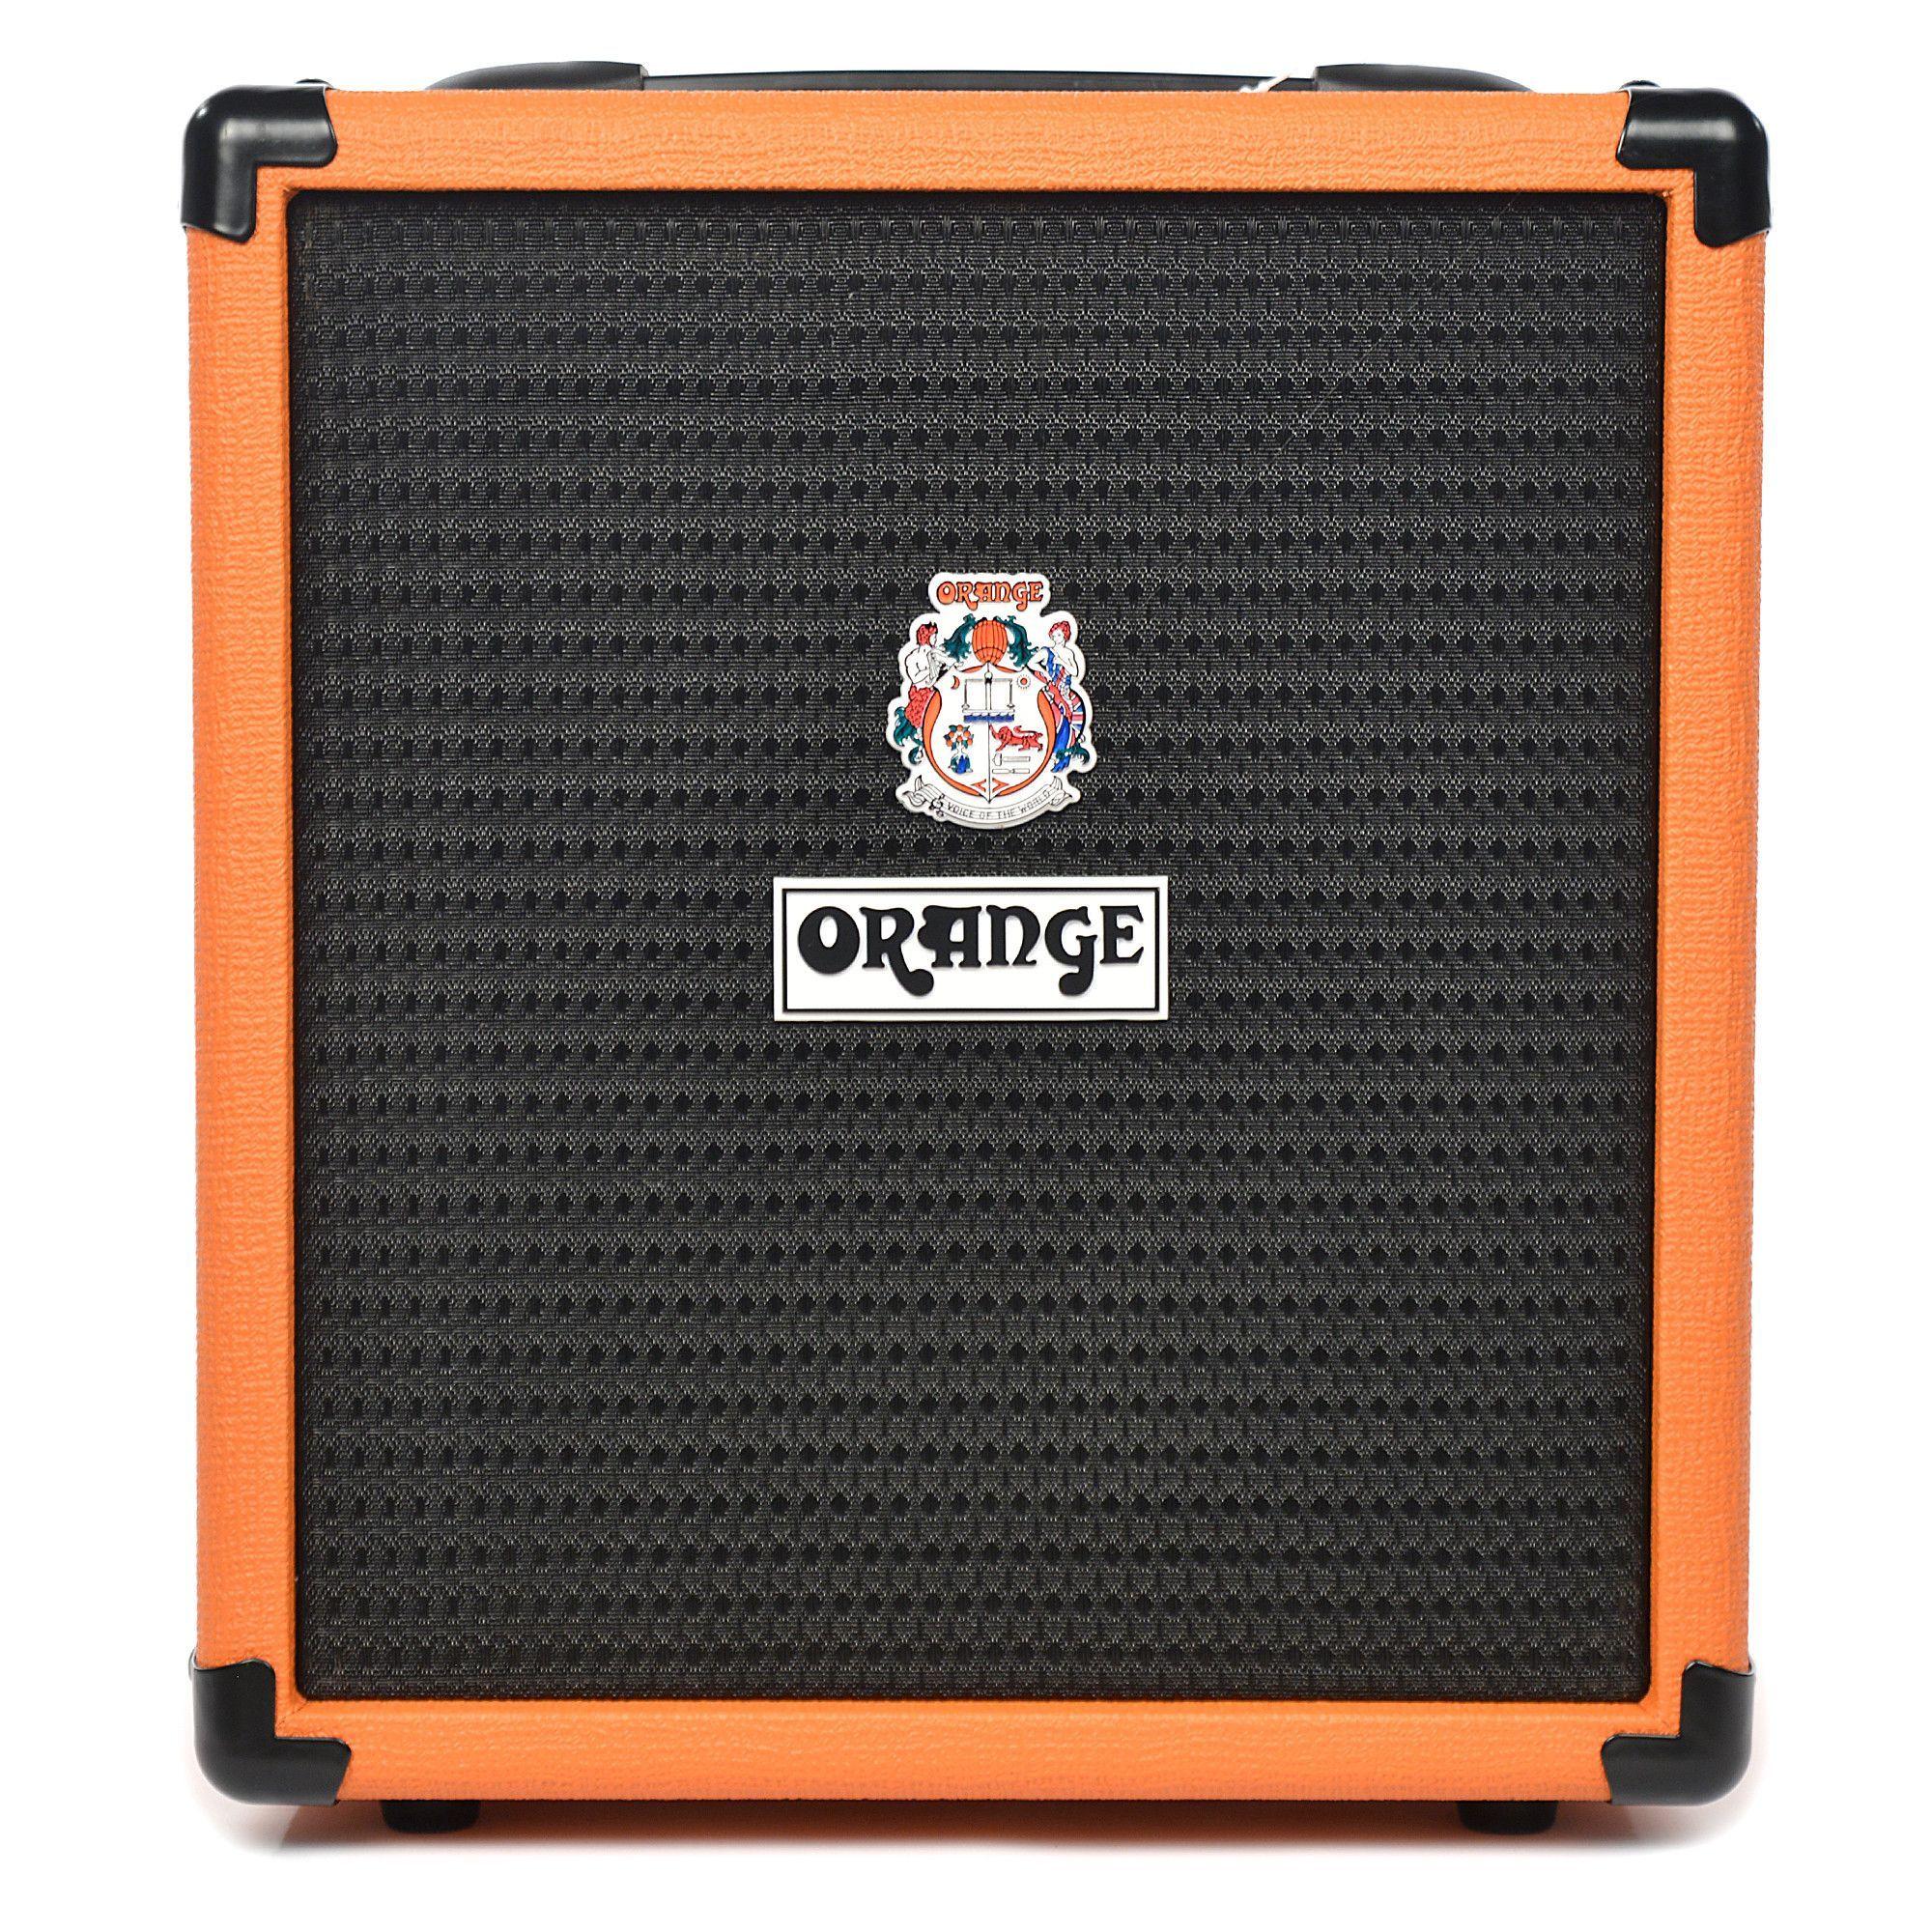 Orange Crush Bass 25 1x8 25w Combo   Orange Amps   Orange